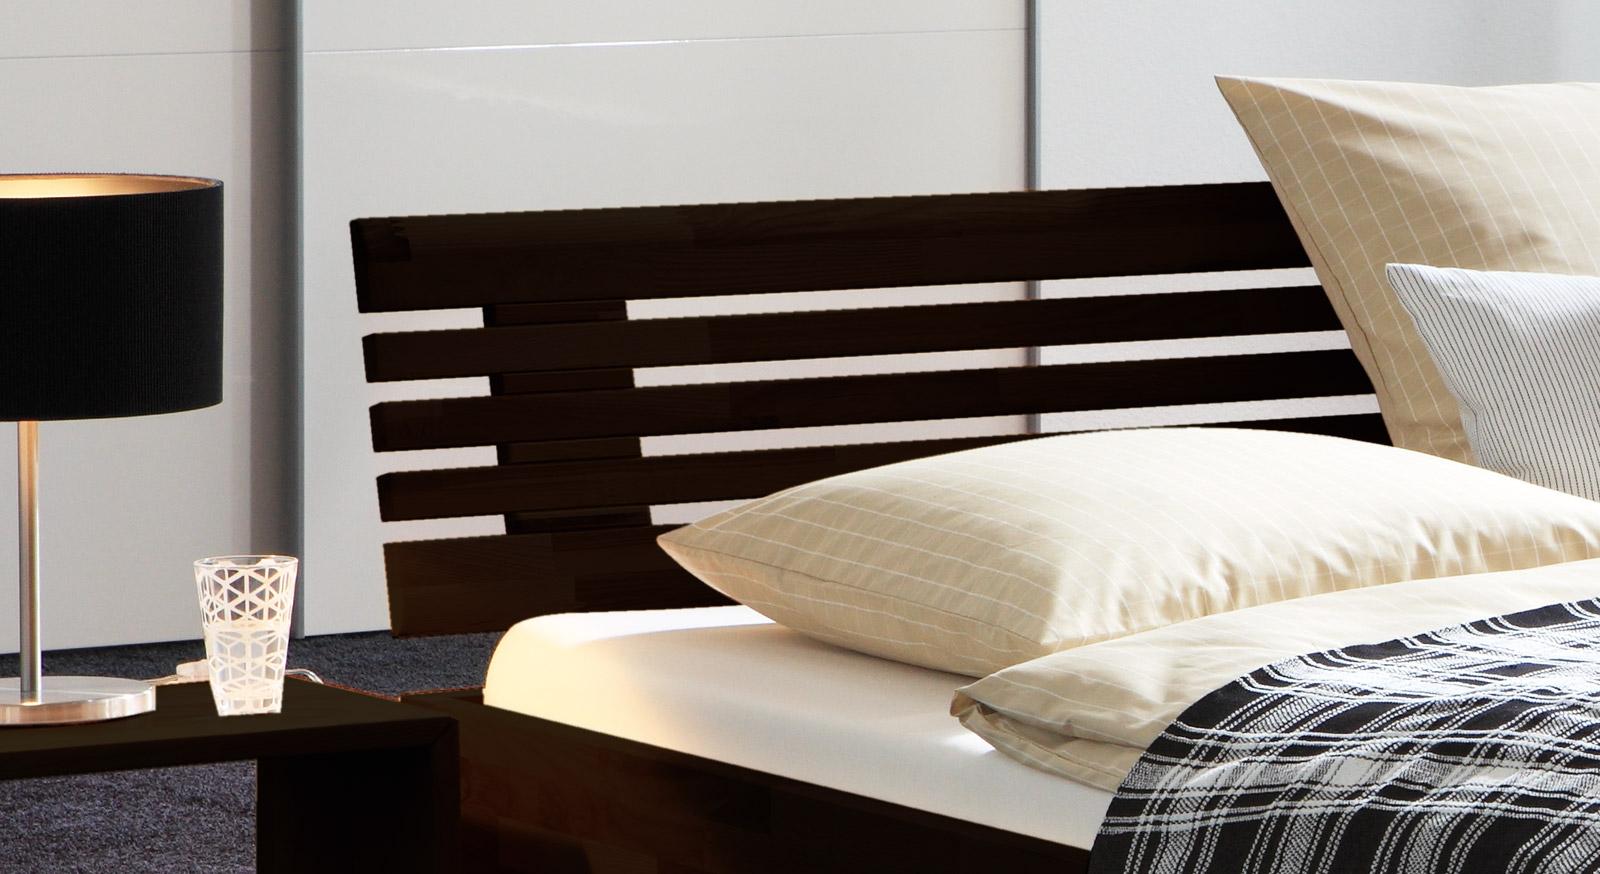 Stabiles Bett Fontana mit hochwertigem Sprossen-Kopfteil.